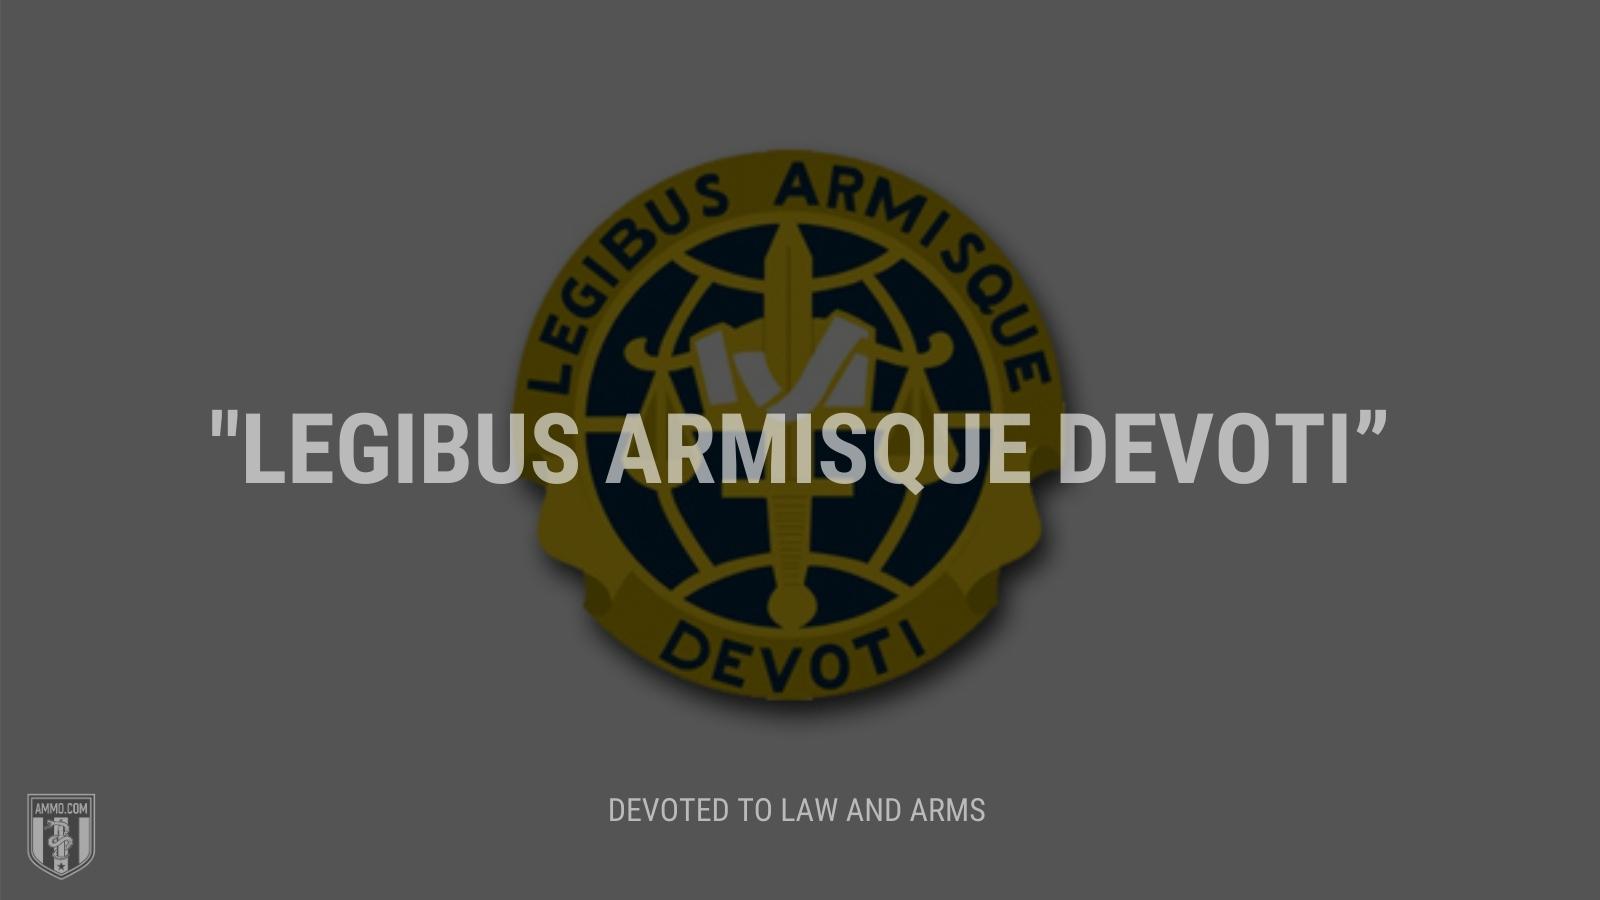 """Legibus armisque devoti"" - Devoted to law and arms"